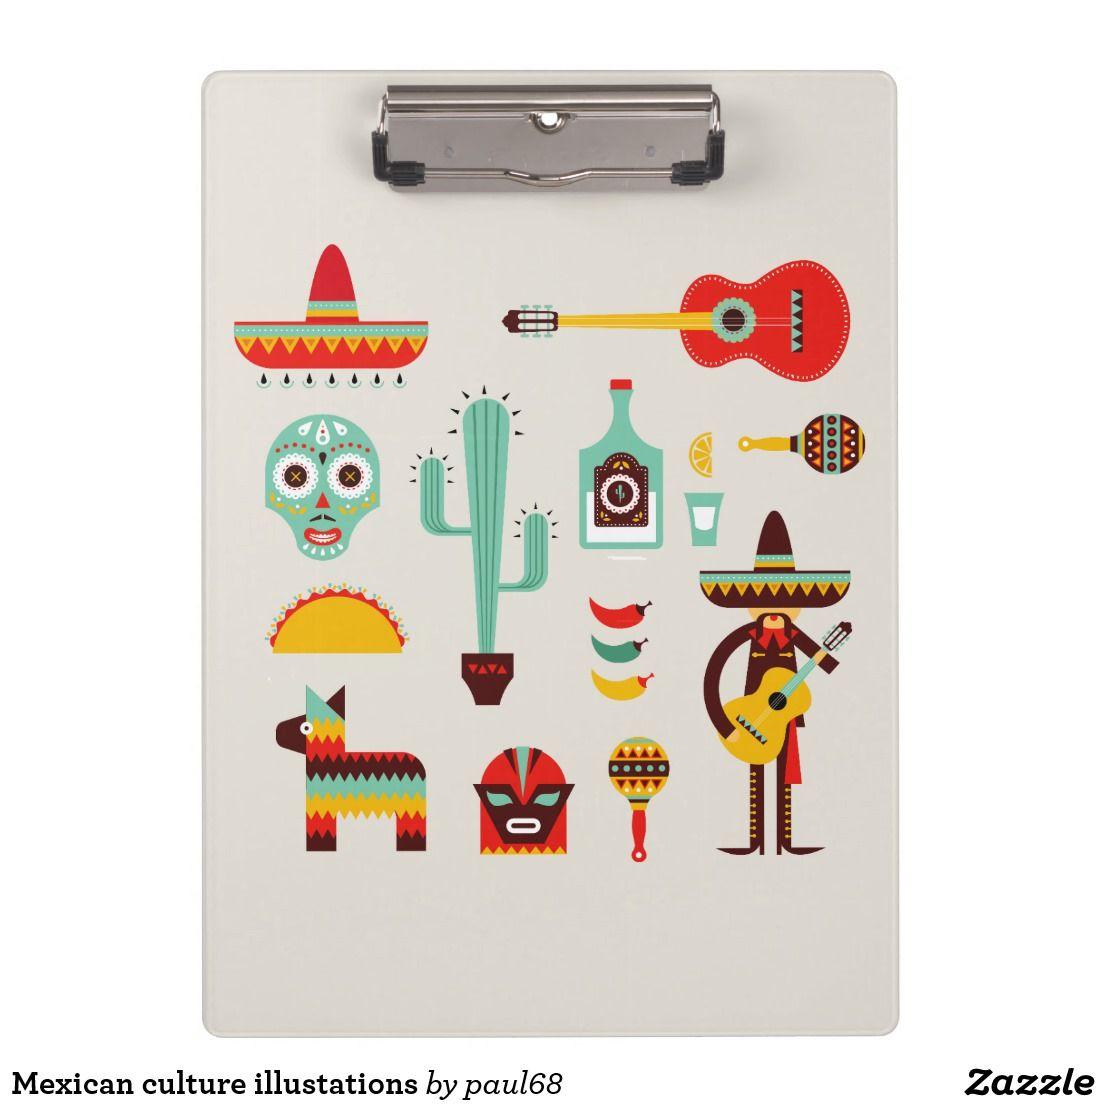 Mexican culture illustations clipboard   Zazzle.com #mexicanculture